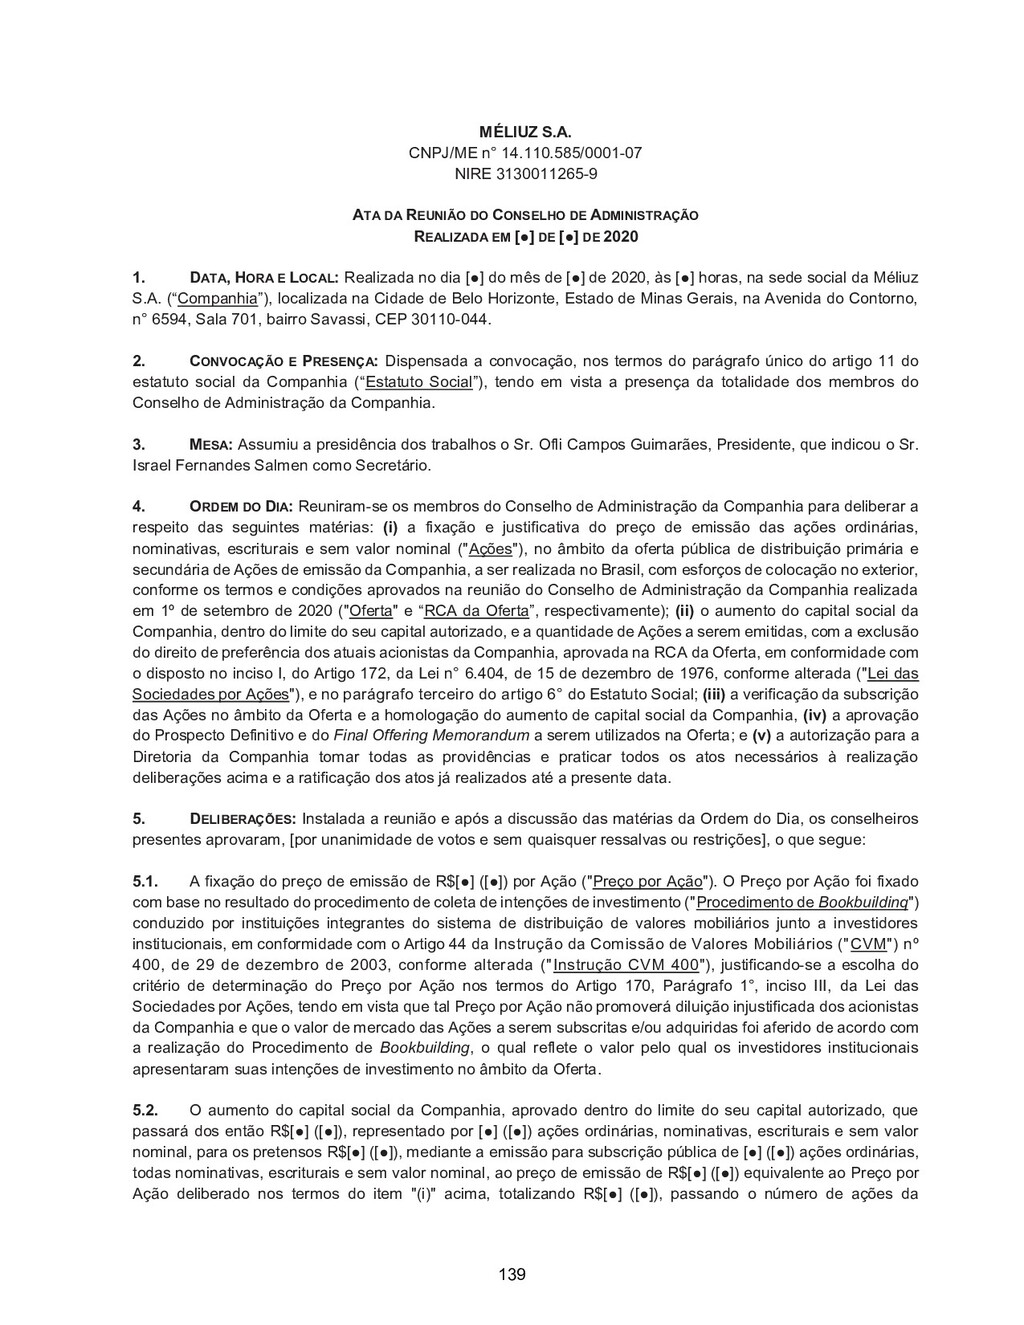 MÉLIUZ S.A. CNPJ/ME n° 14.110.585/0001-07 NIRE ...